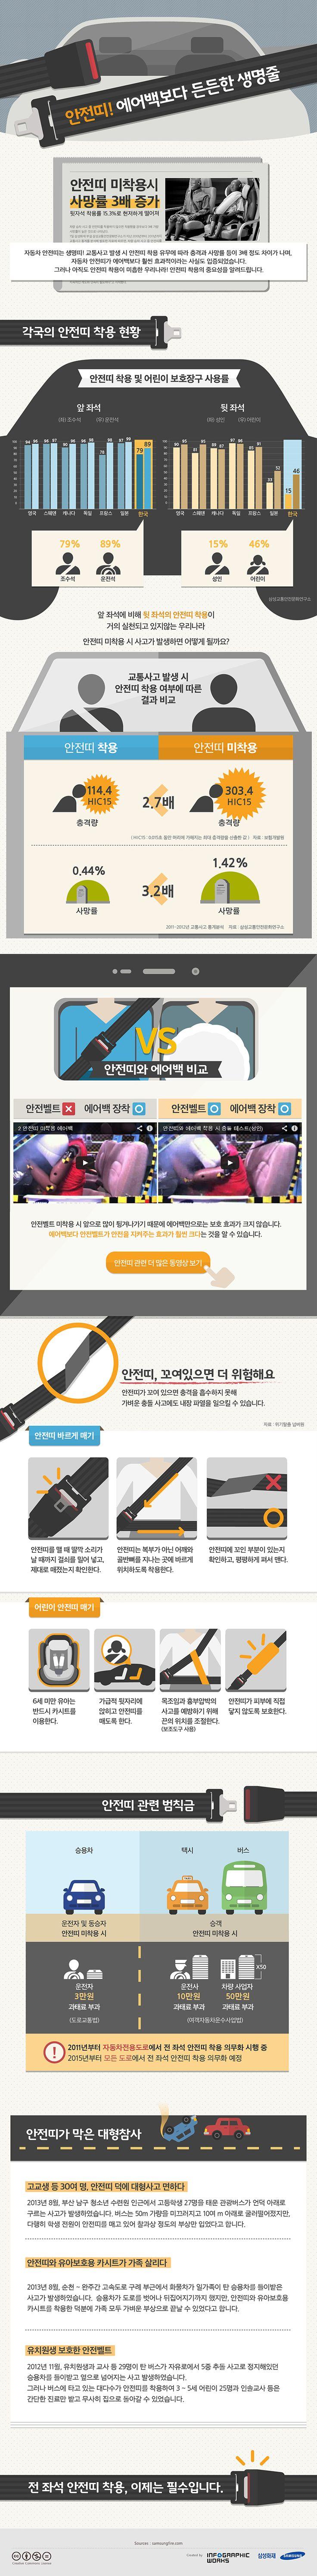 [Infographic] 안전띠 착용에 관한 인포그래픽